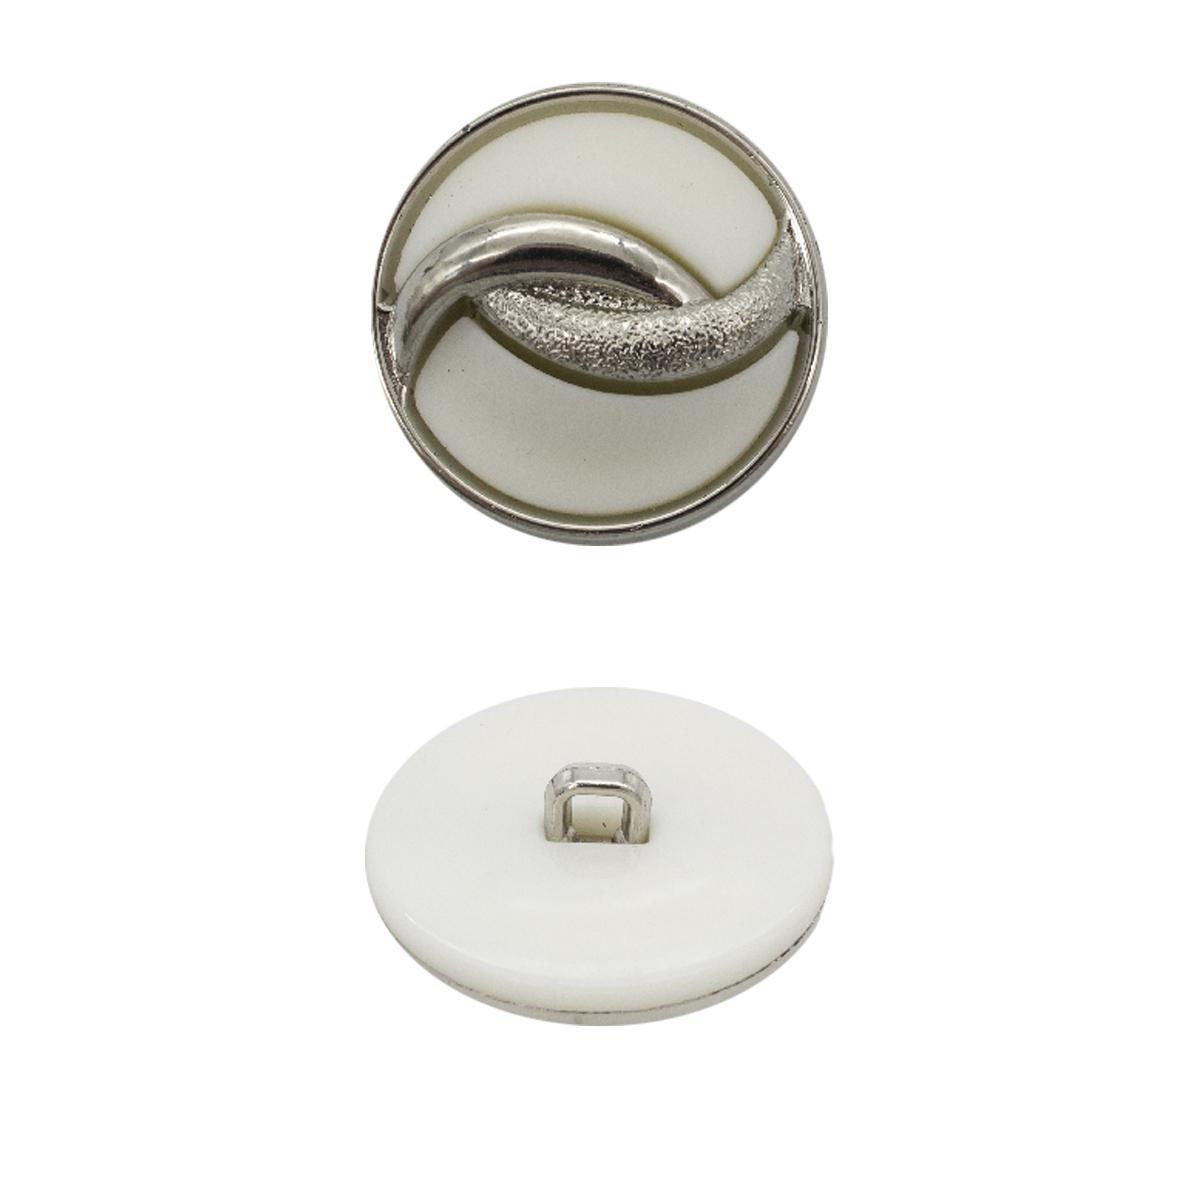 ВАВ3659 Пуговица 28мм (никель/белая резина)